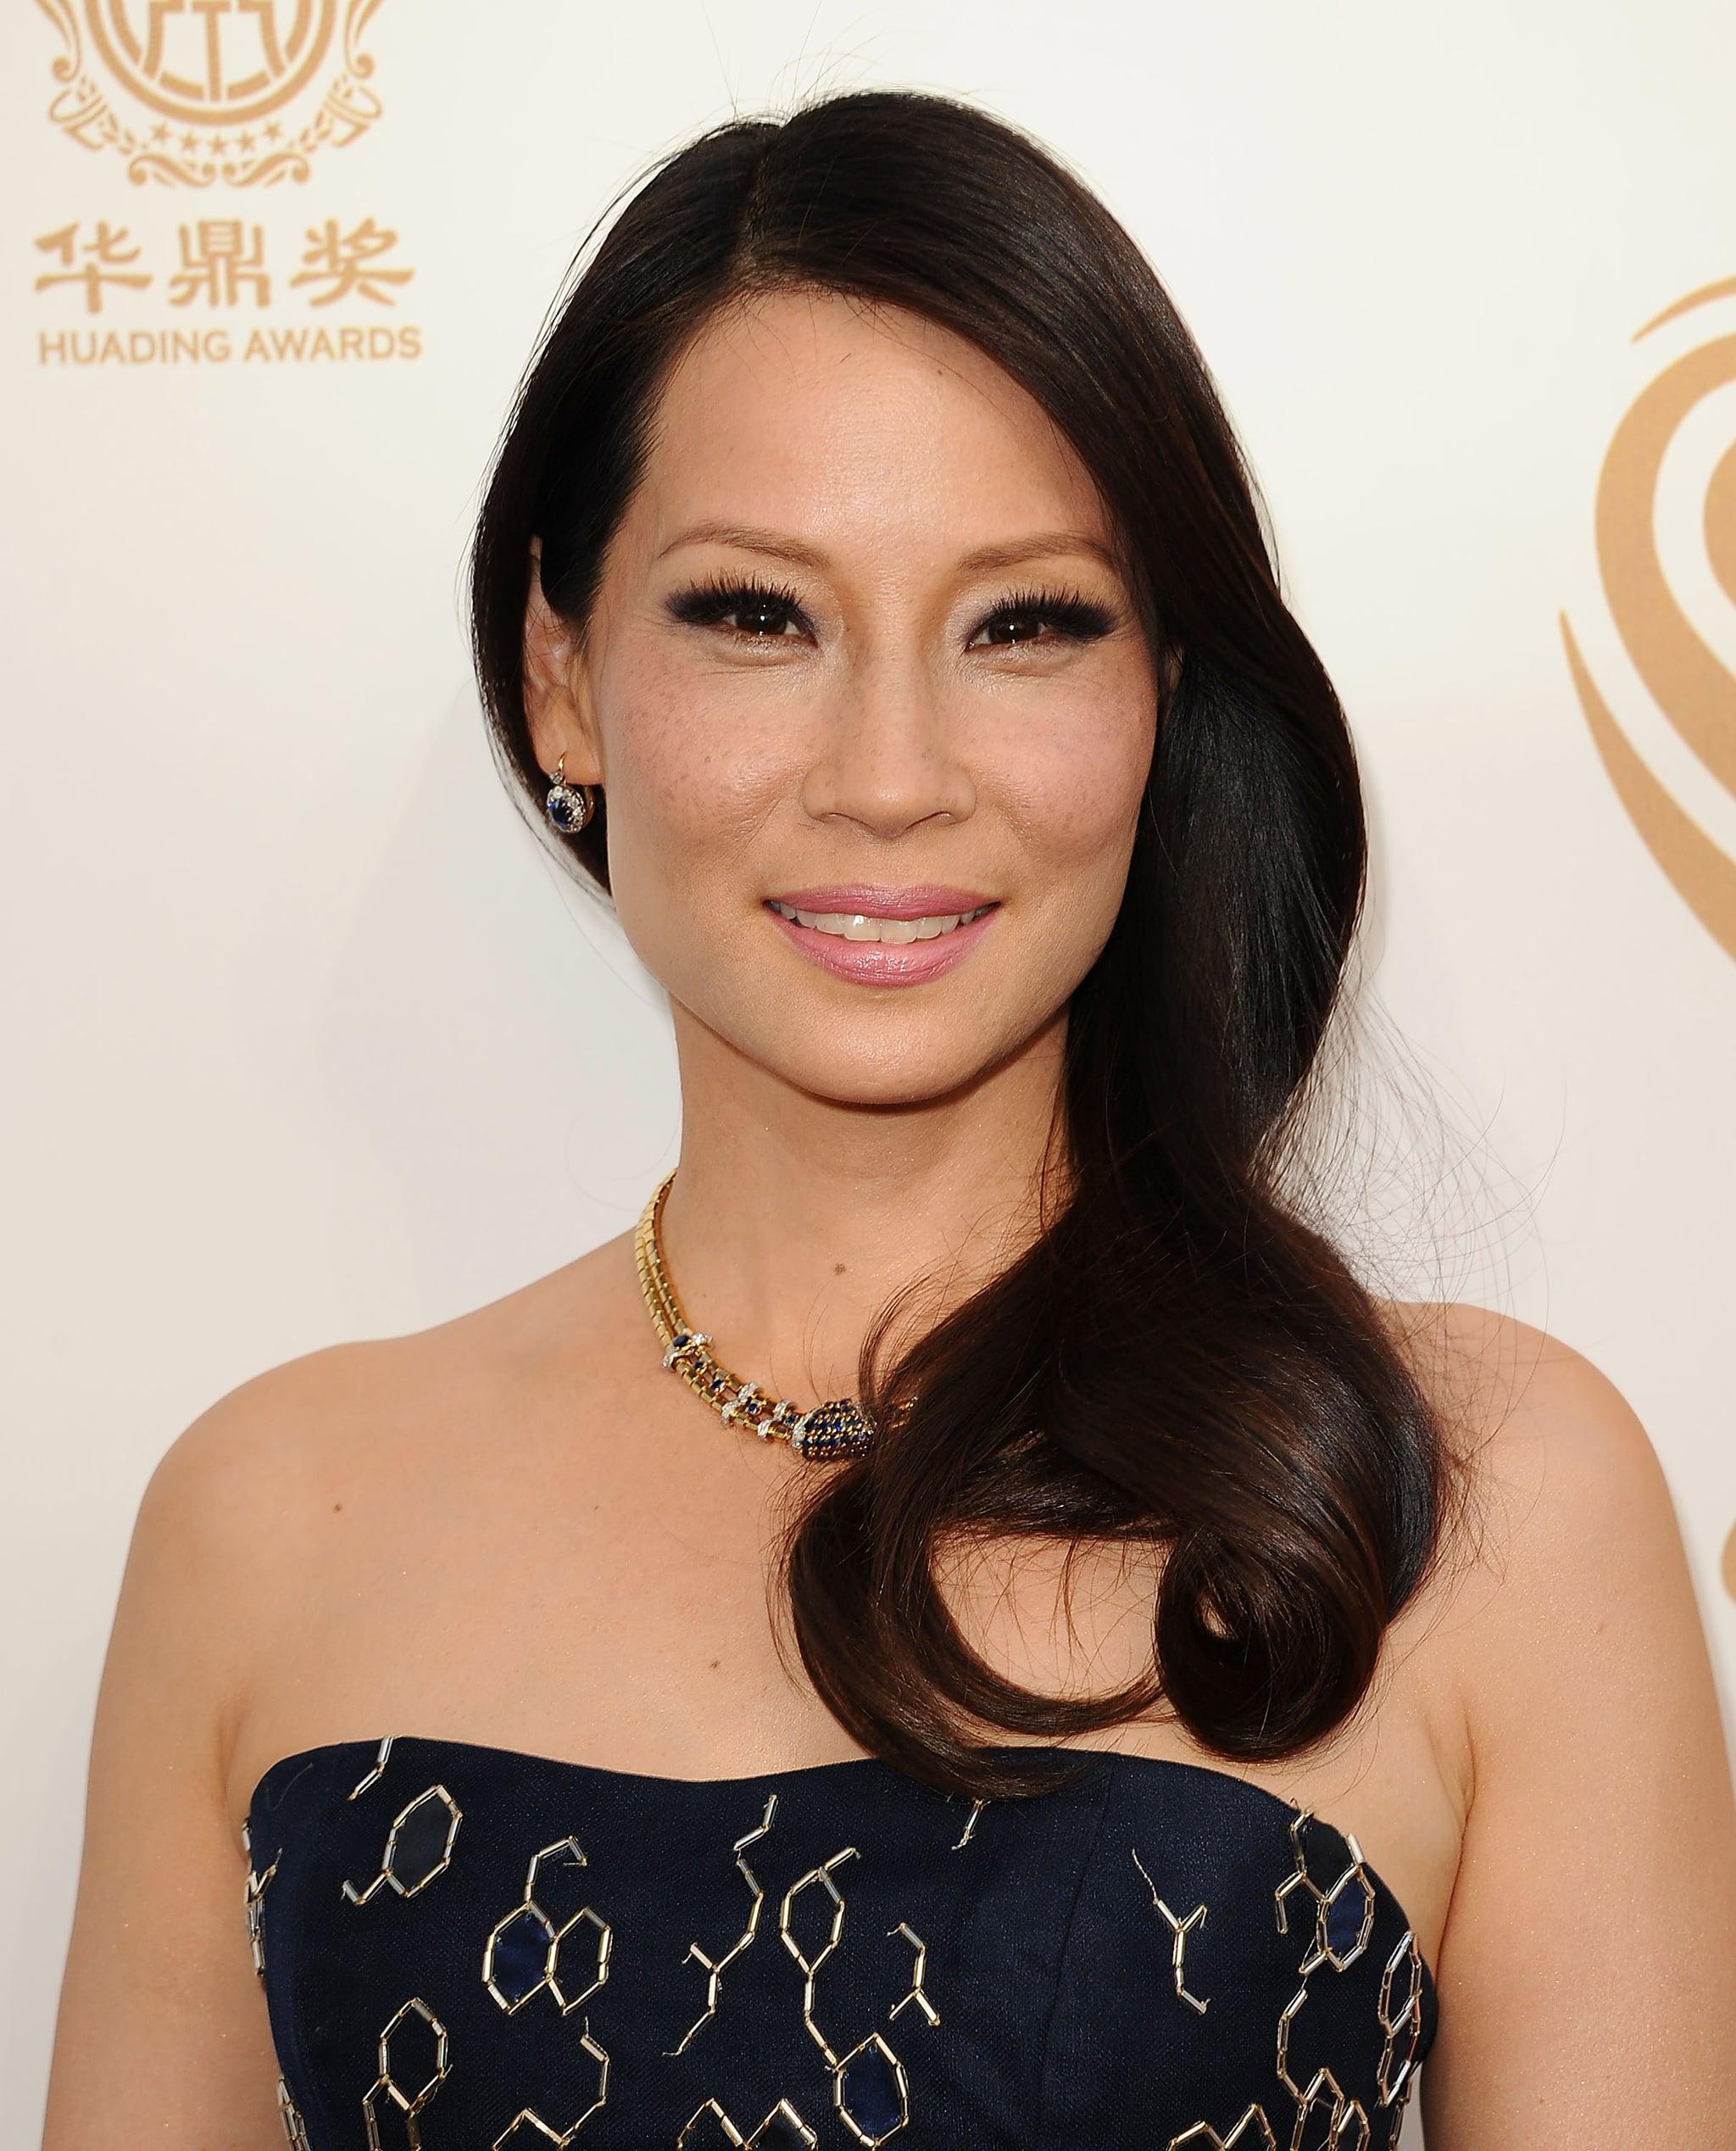 Lucy Liu, 45